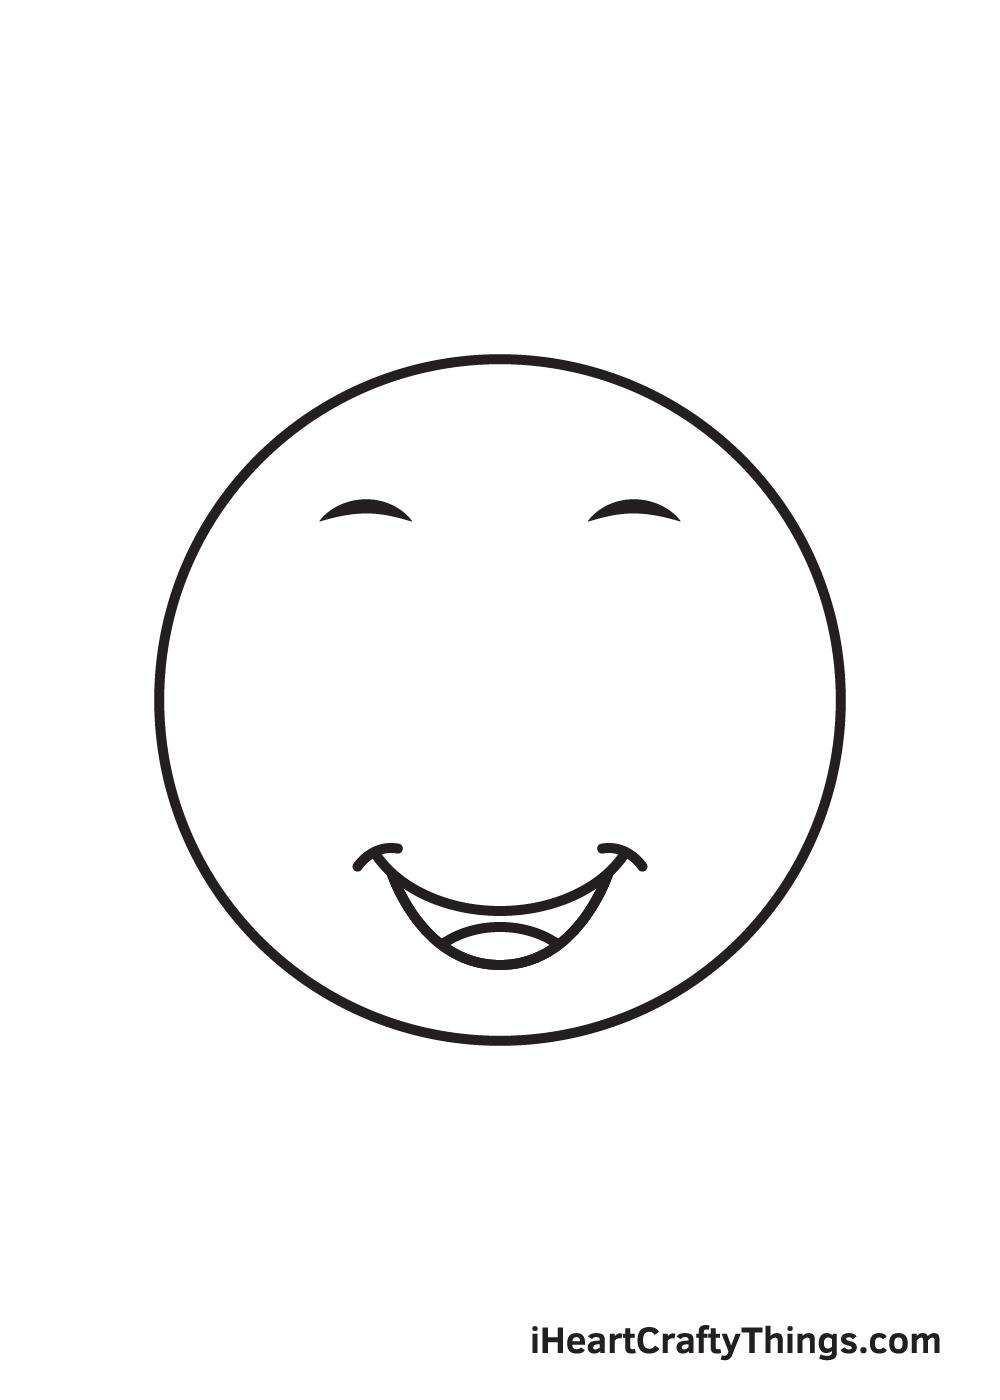 Emojis Drawing – Step 6